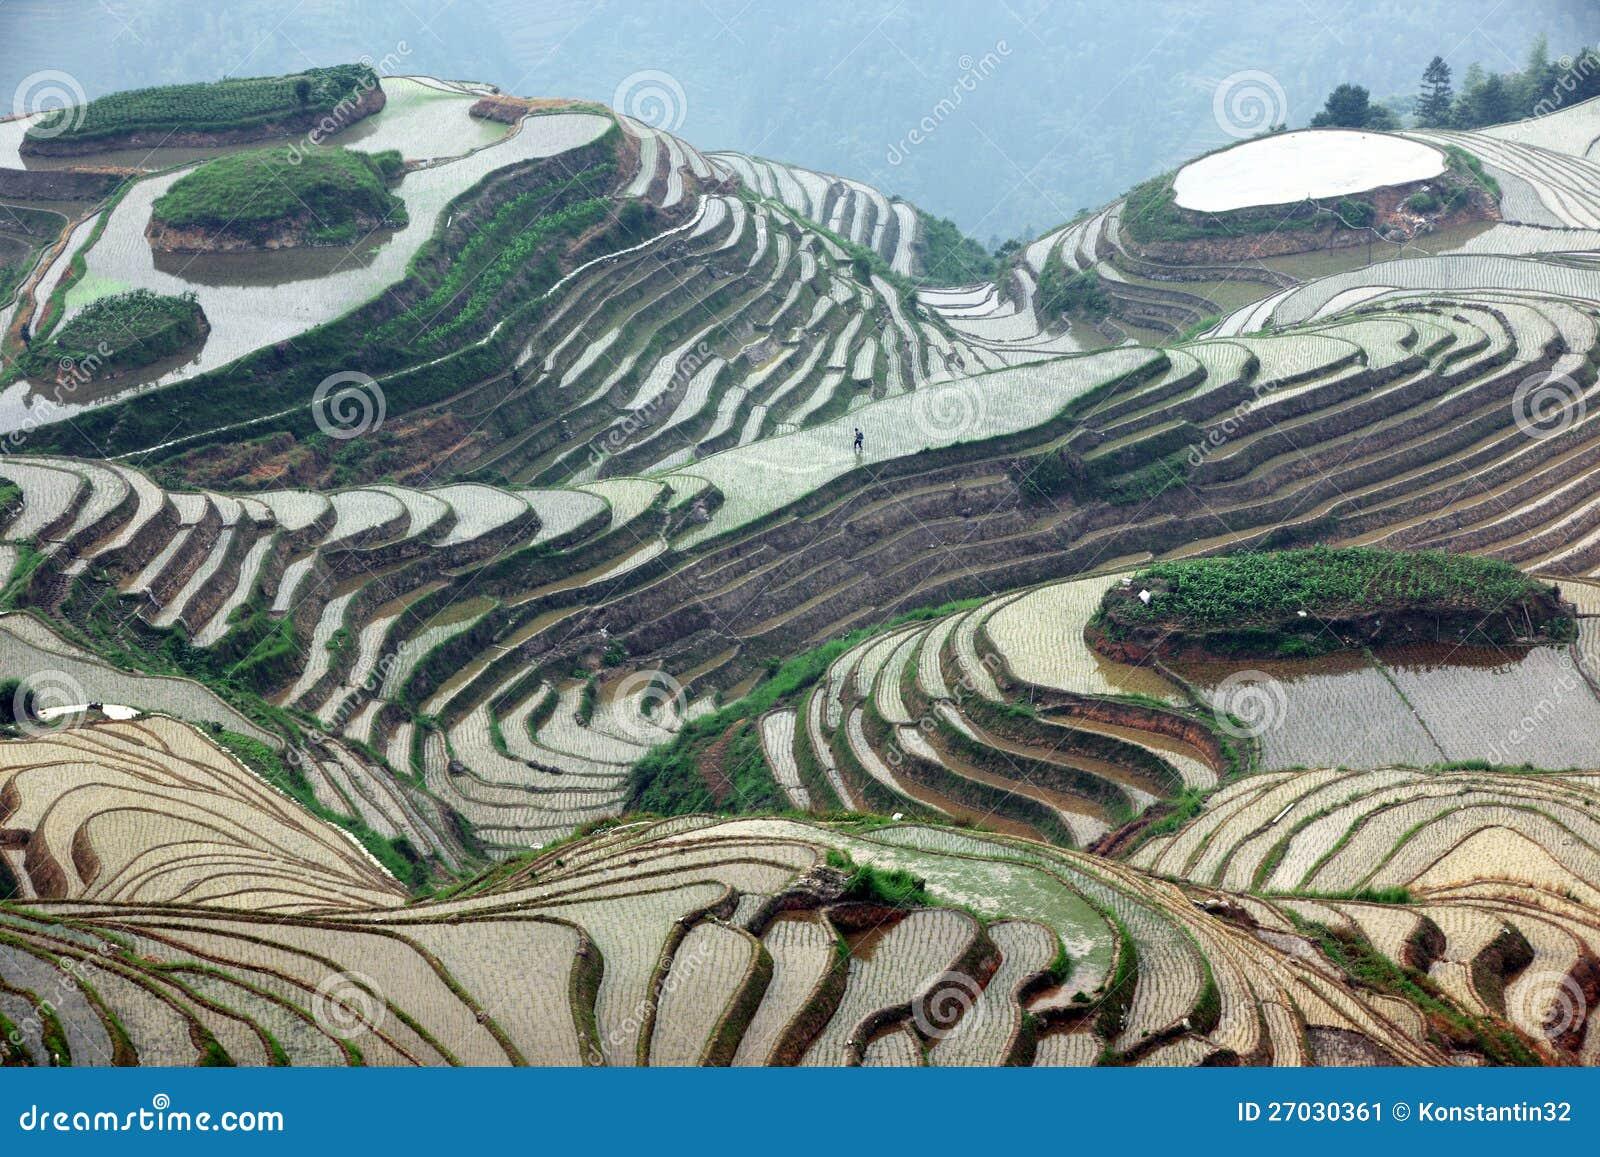 De rijstterrassen van Longji, China